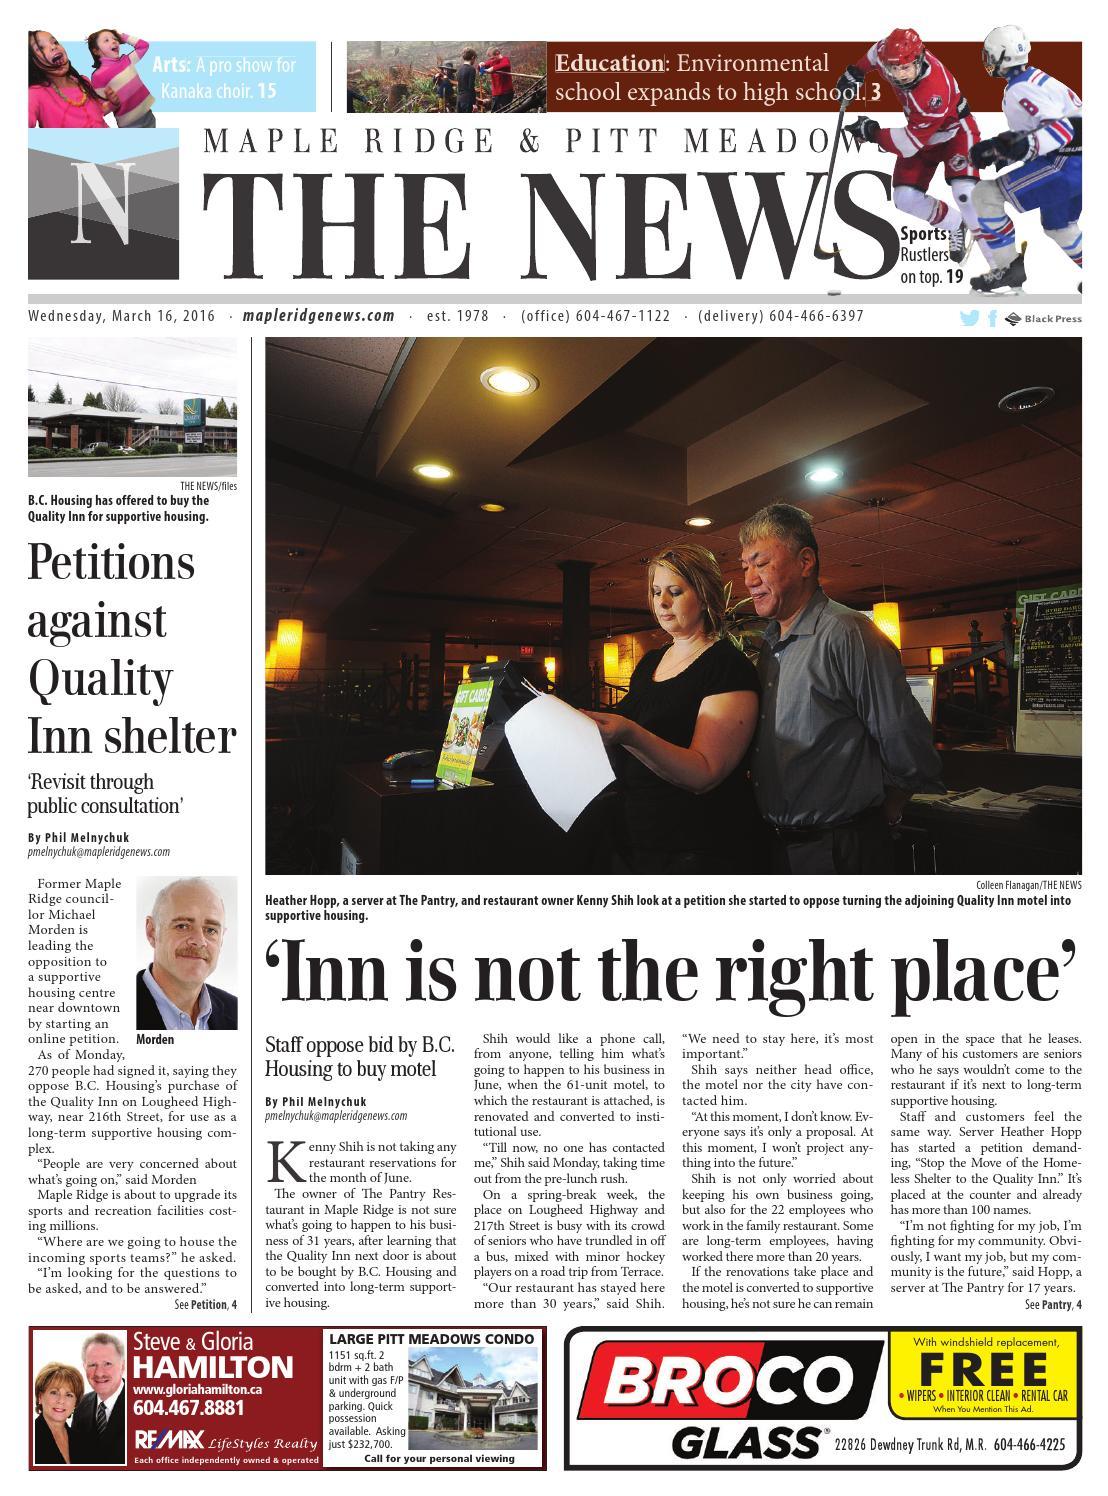 Maple Ridge News, March 16, 2016 by Black Press Media Group